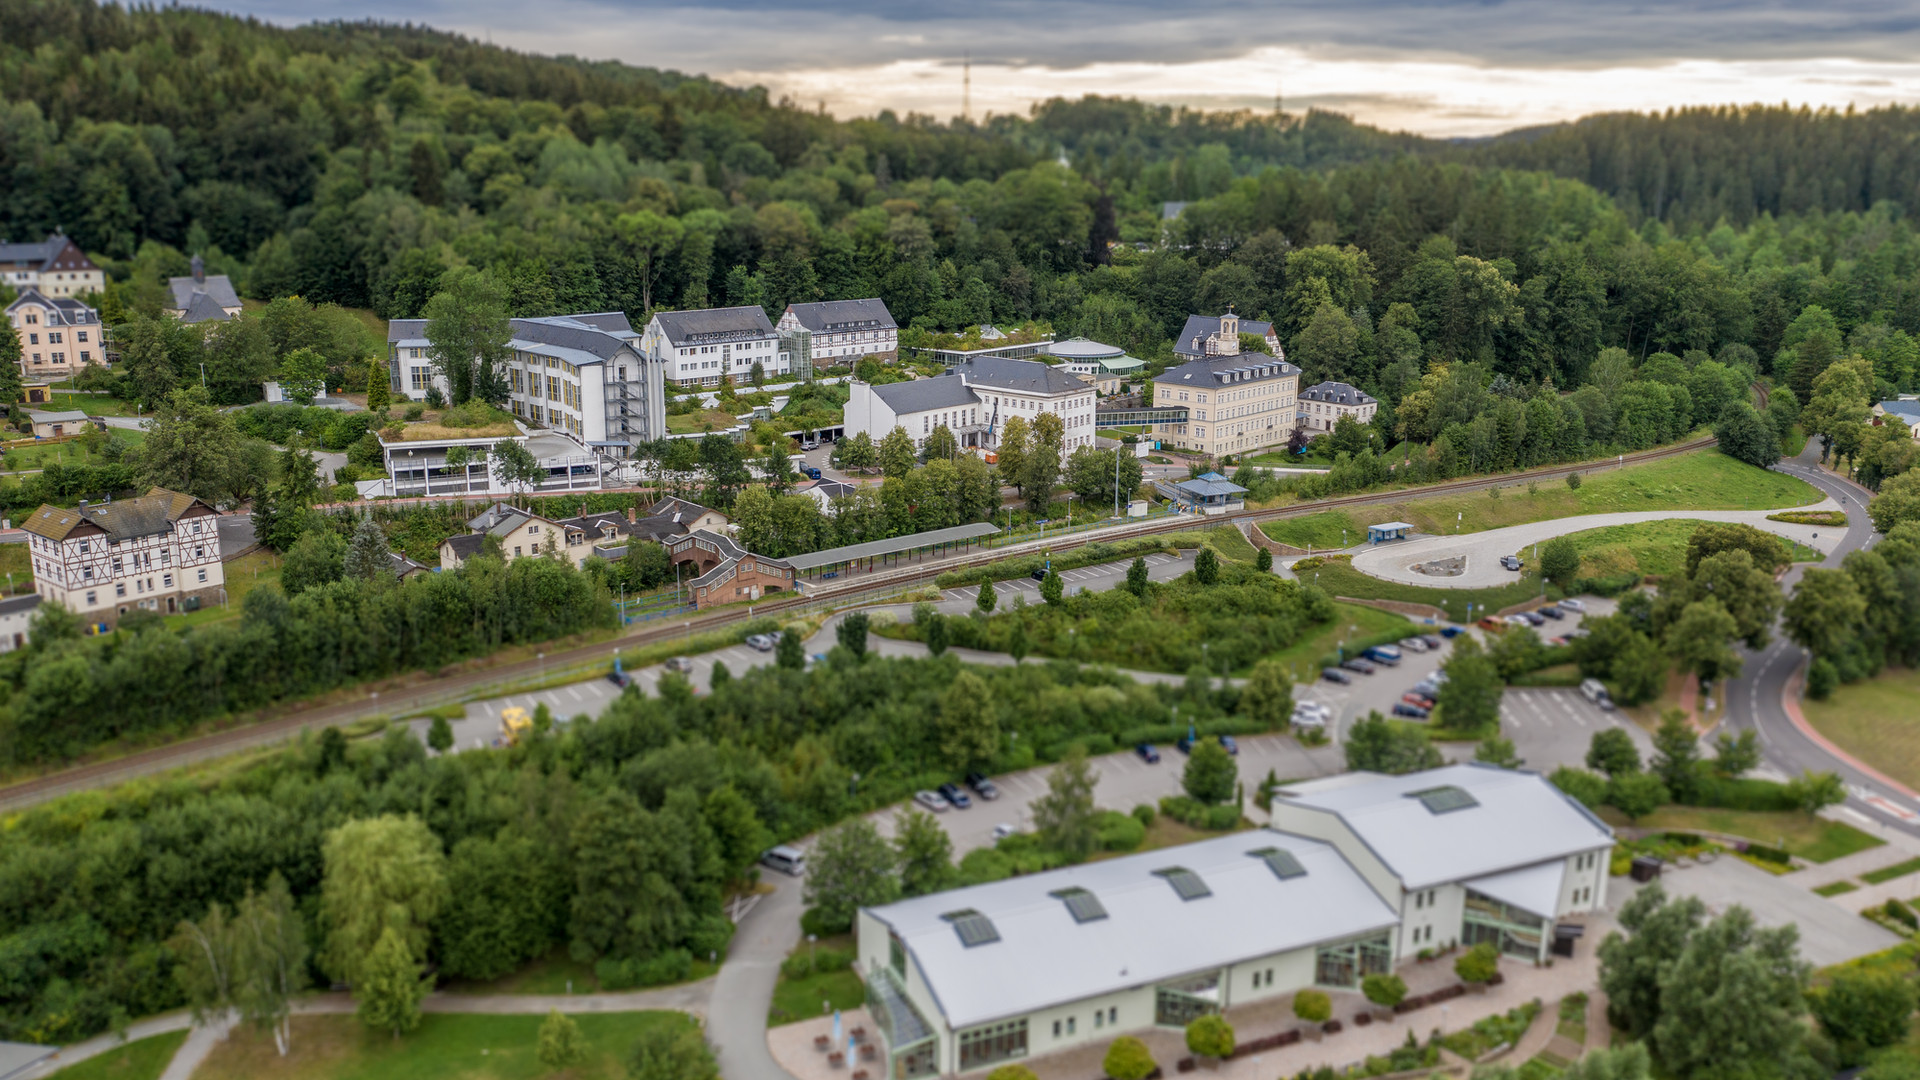 Luftaufnahmen-Thermalbad-Wiesenbad-Minia